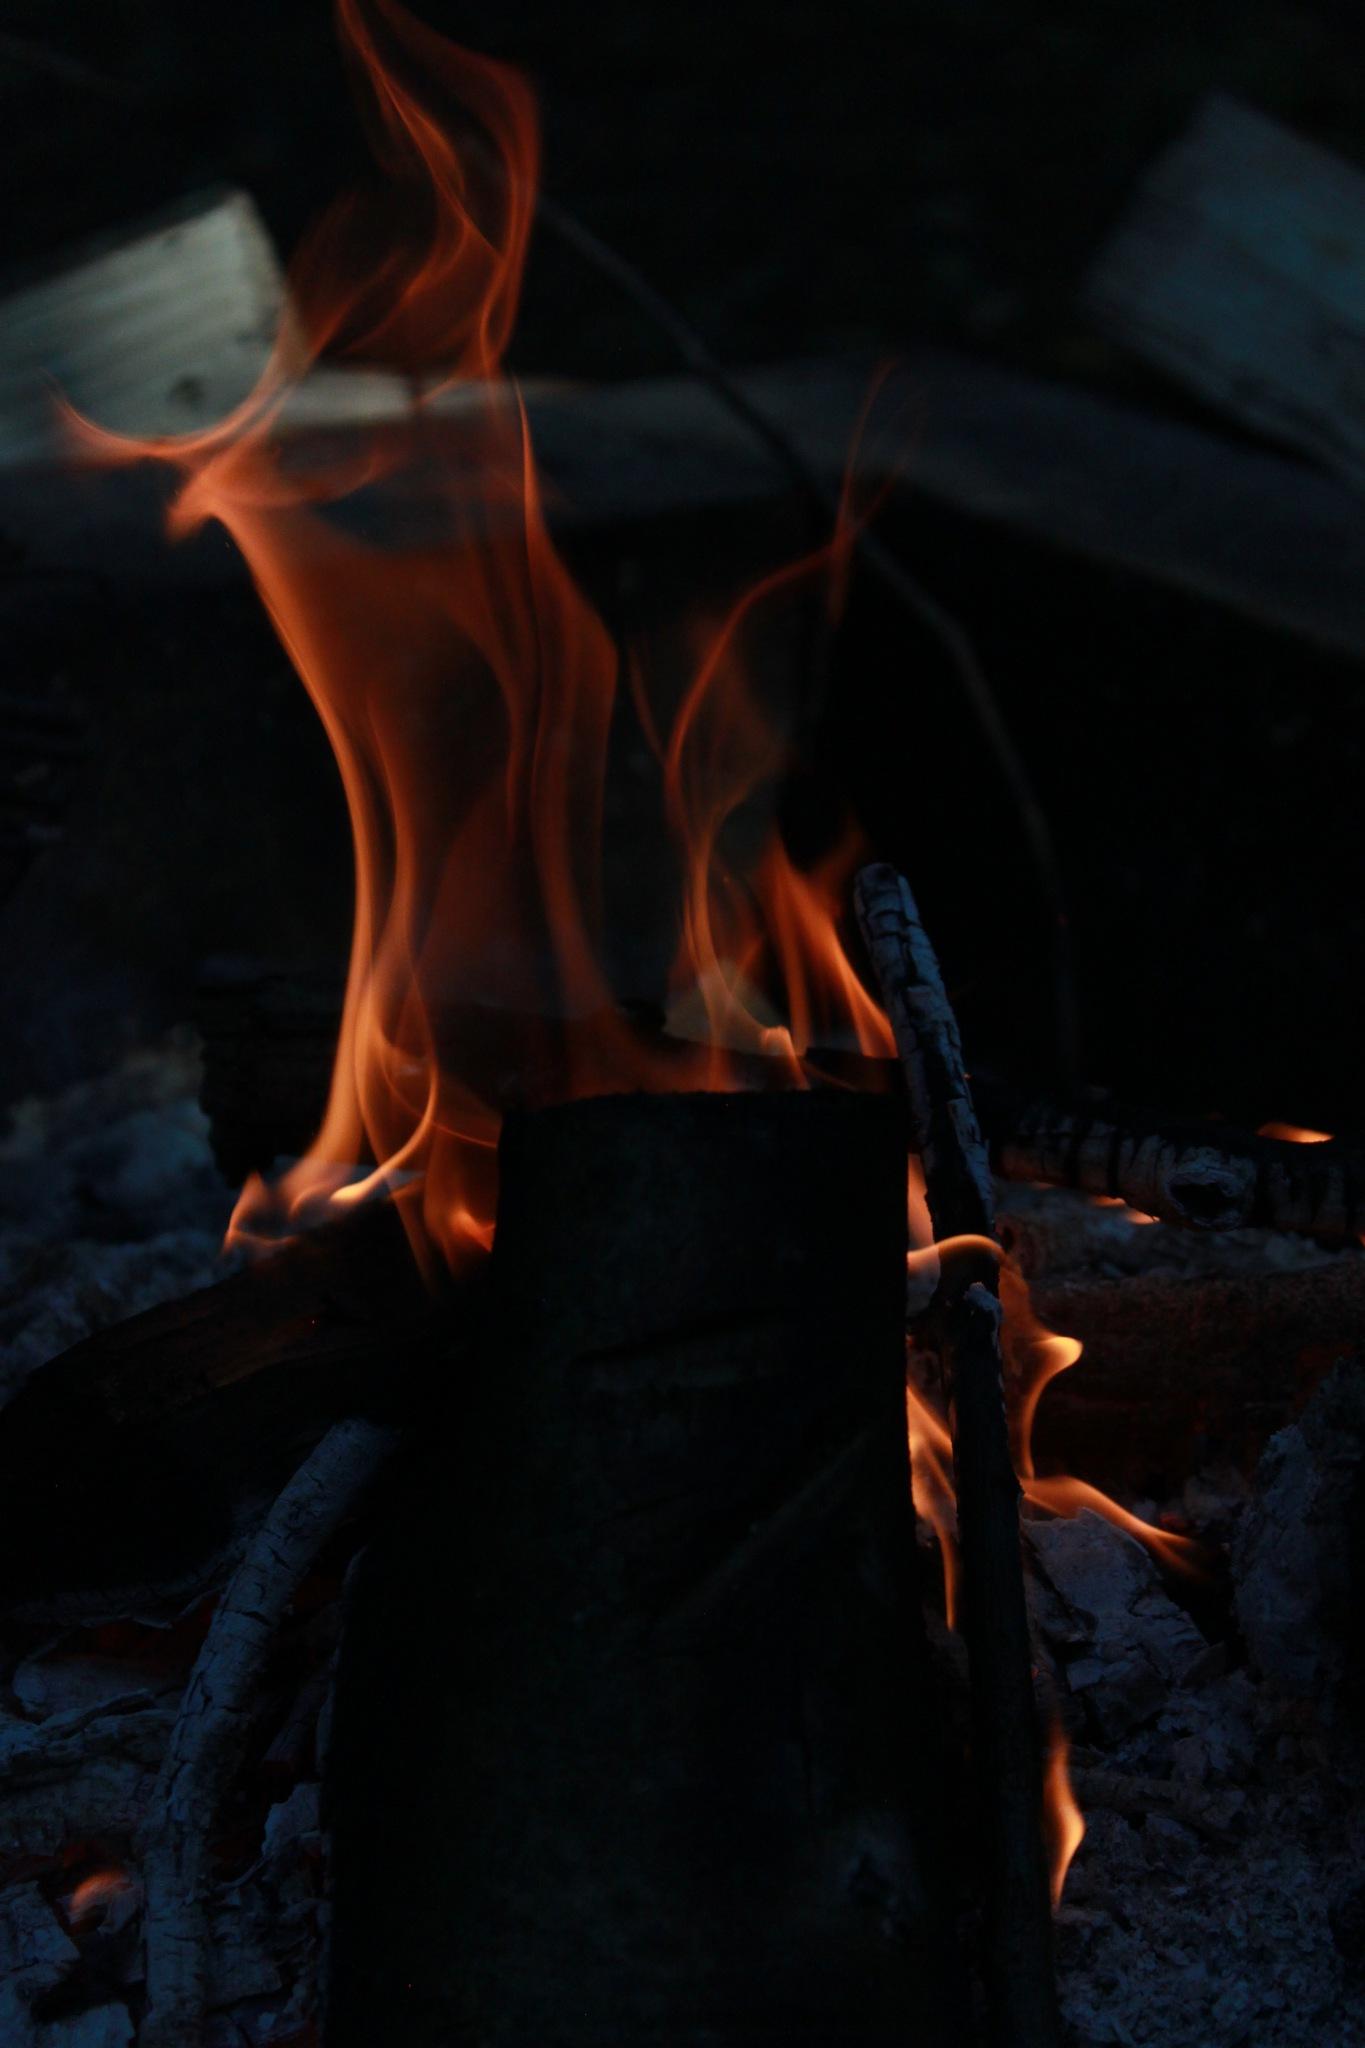 smokey flames by Iriswright